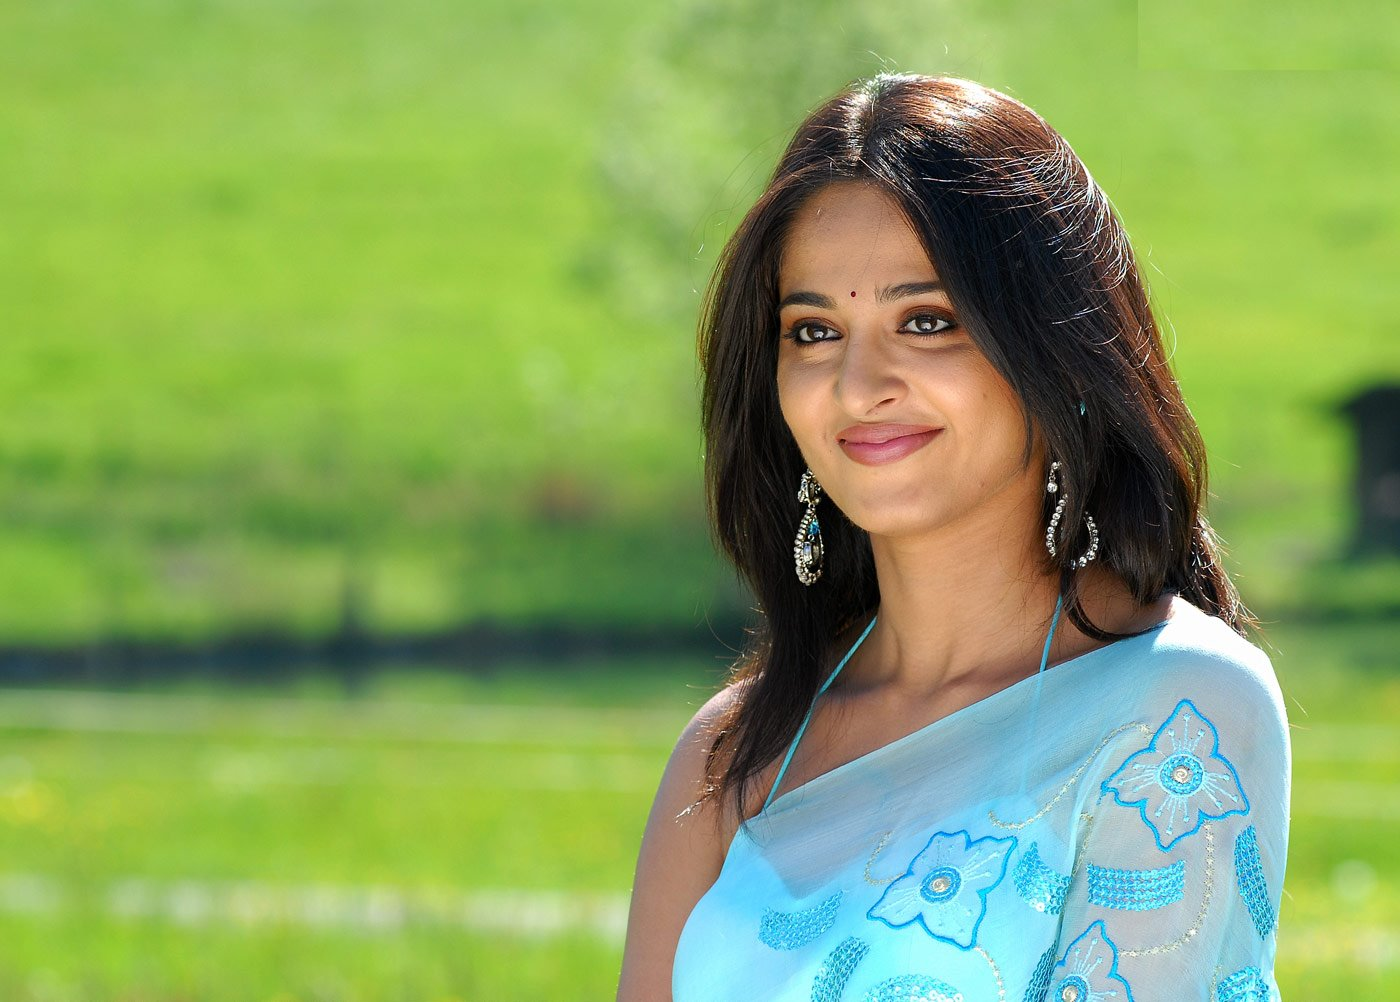 Onushka Hot heroine nude images indian madraje